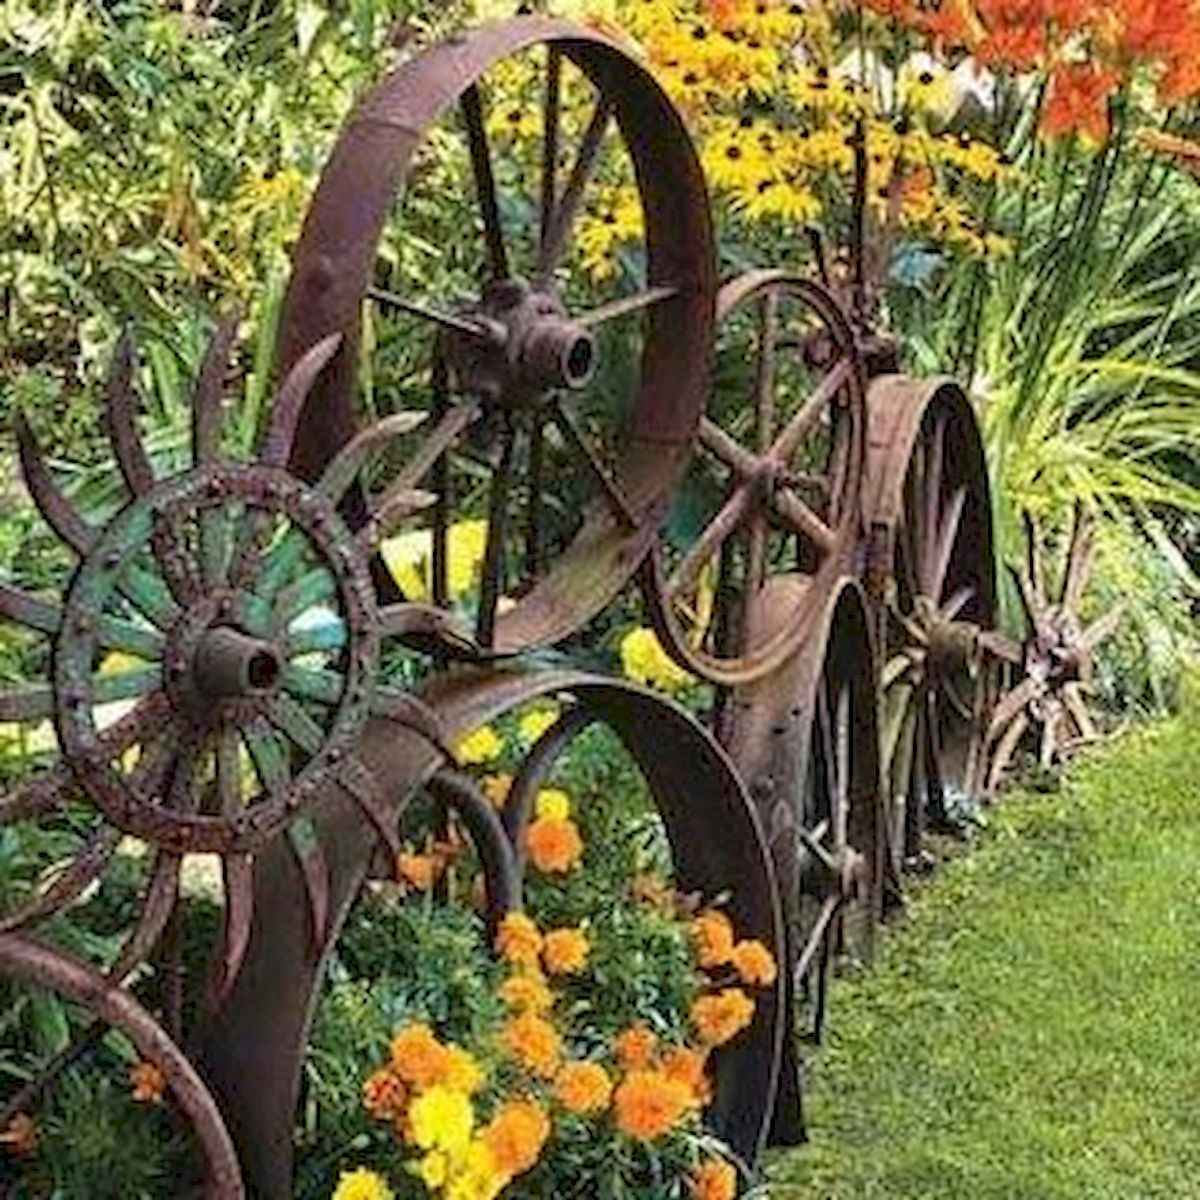 70 creative and genius garden art from junk design ideas for summer (71)